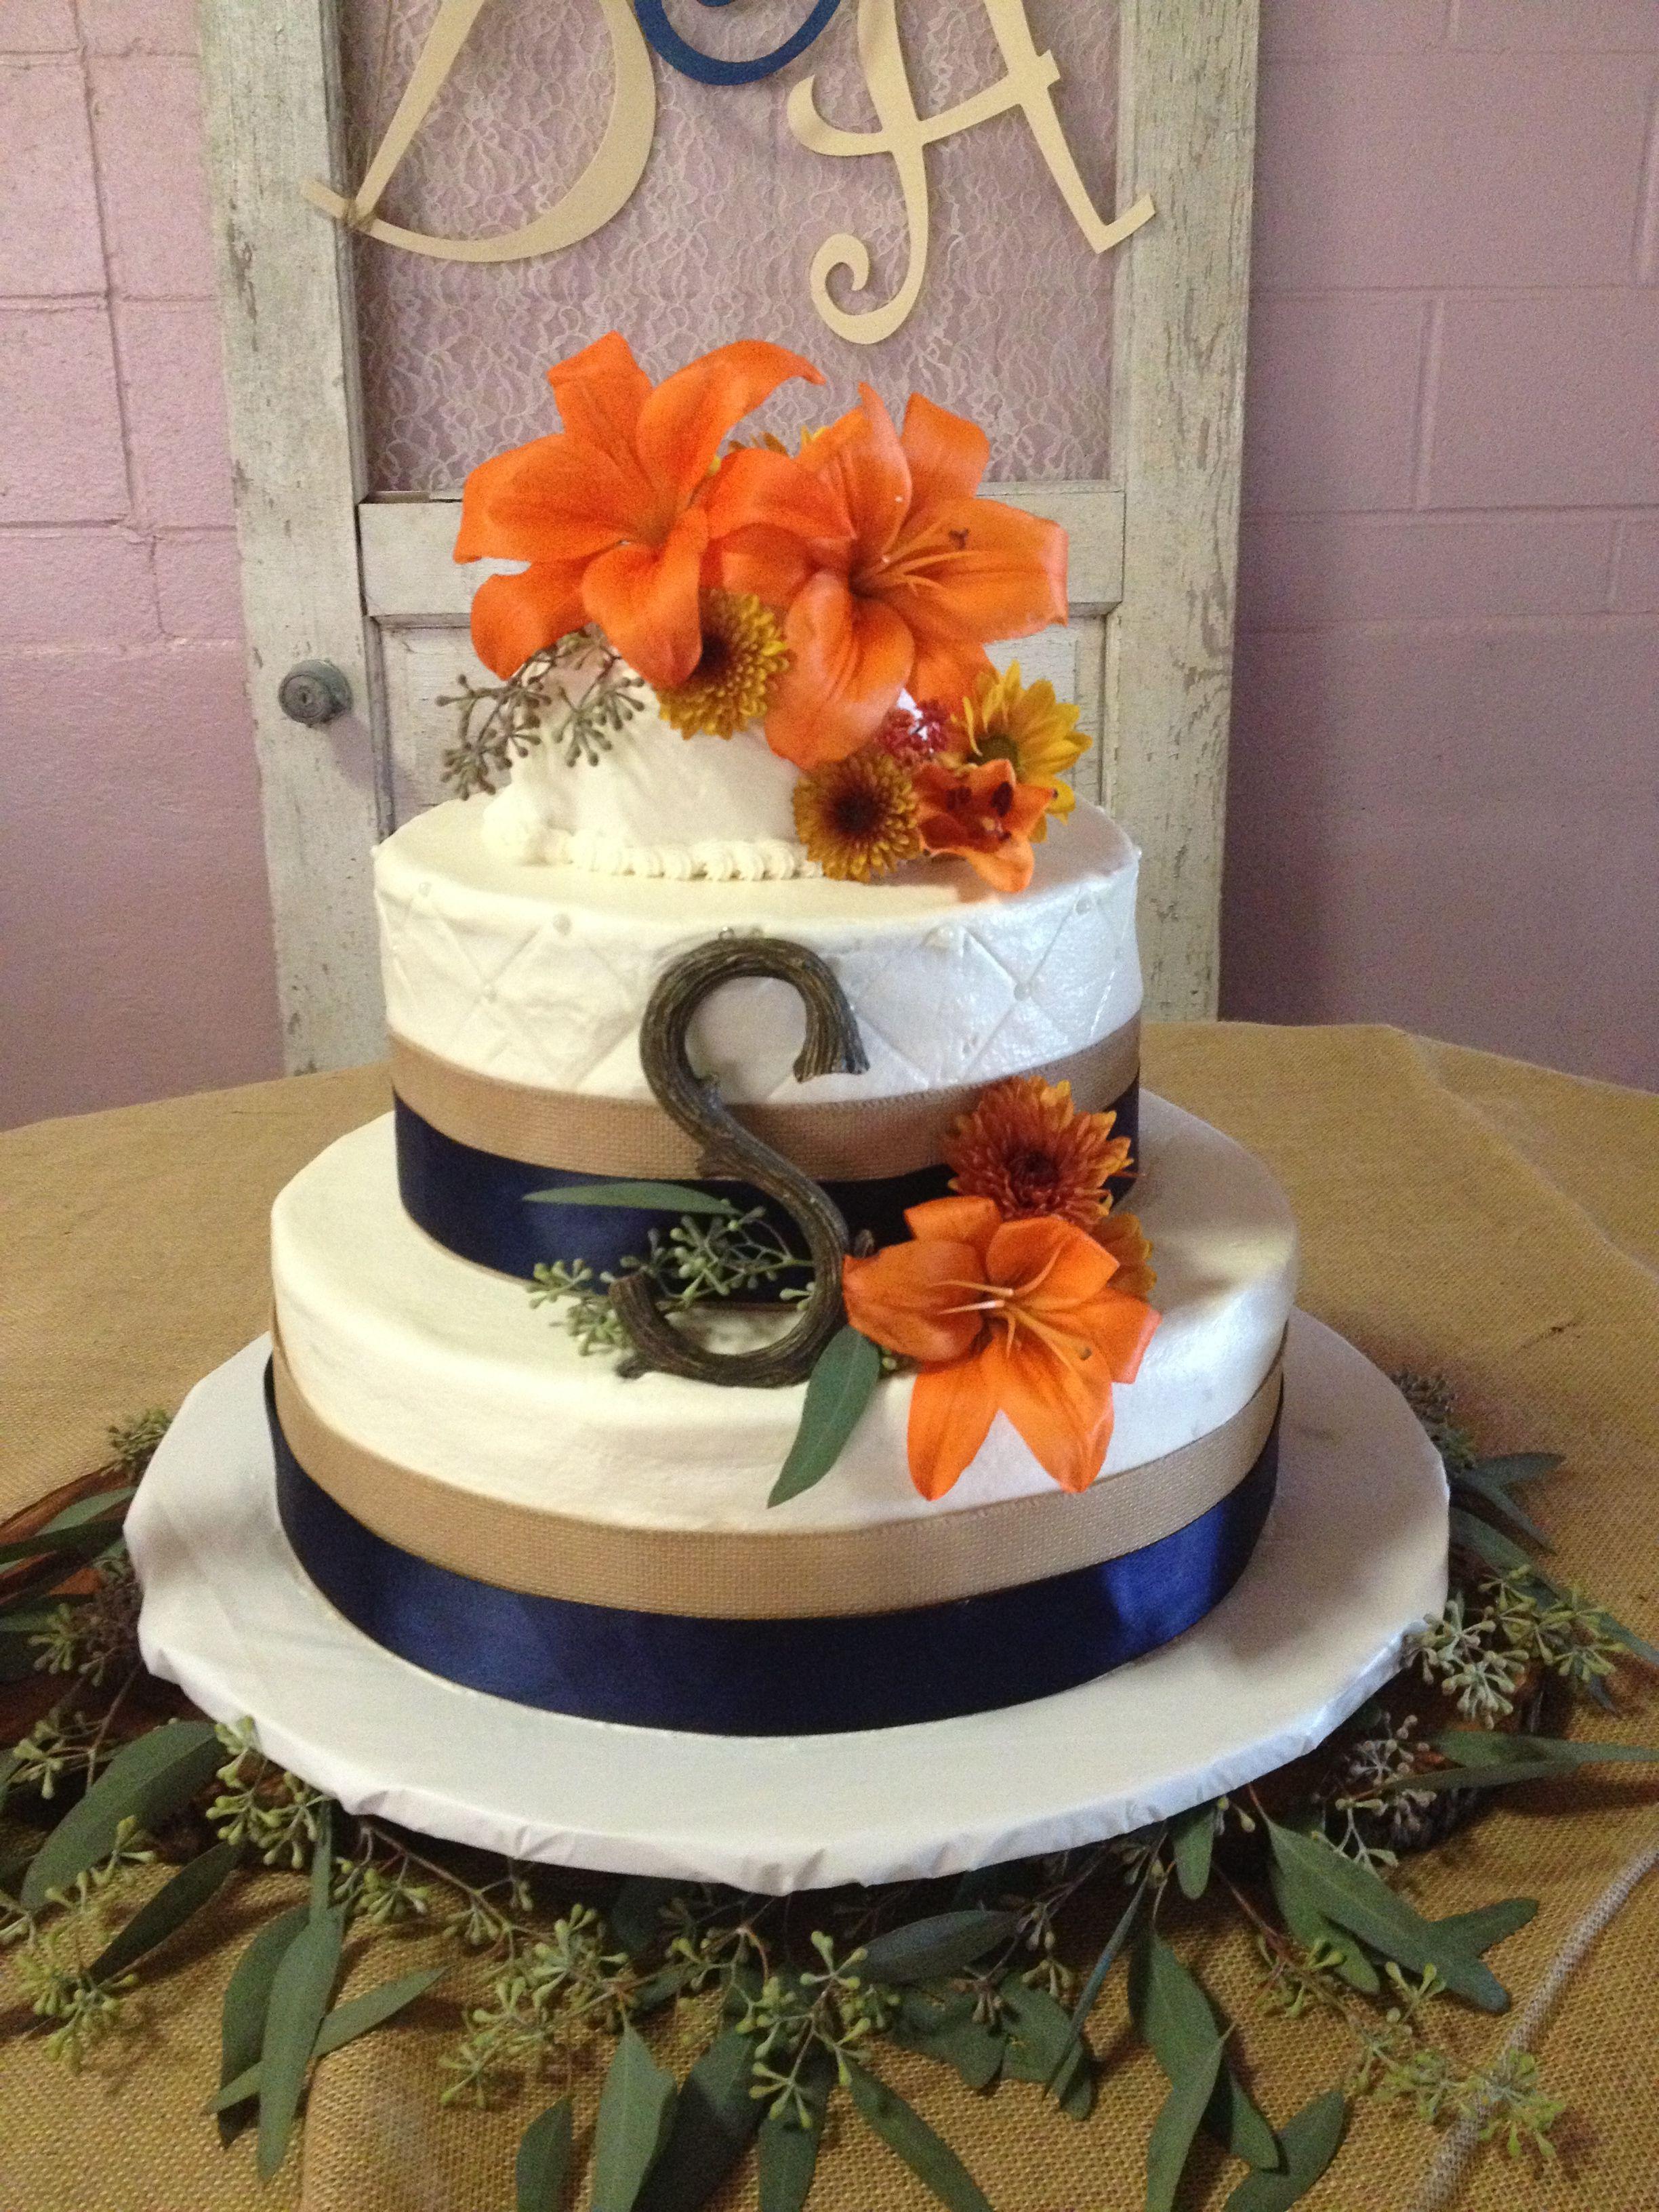 Best Romantic Weddings: burlap wedding cakes | burlap